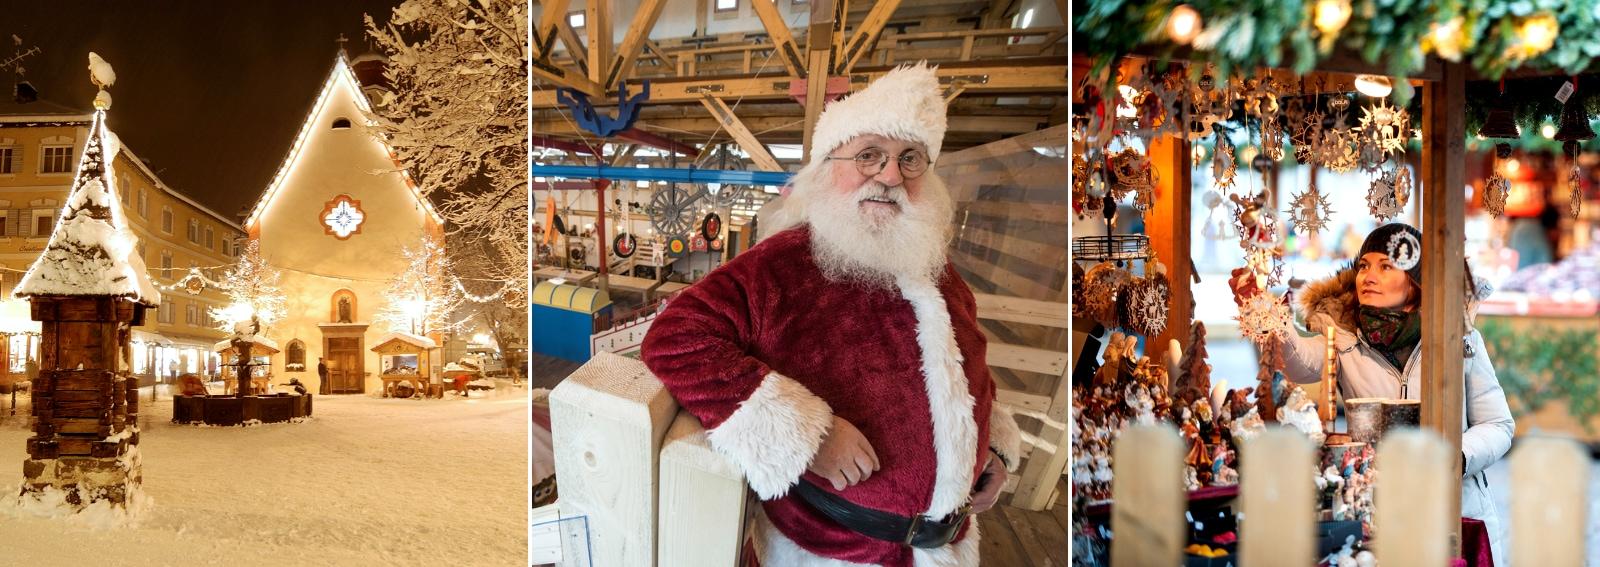 Mercatini di Natale piu belli in Italia Sud Tirol Milano Aosta Val Gardena Napoli Trento Bressanone DESK